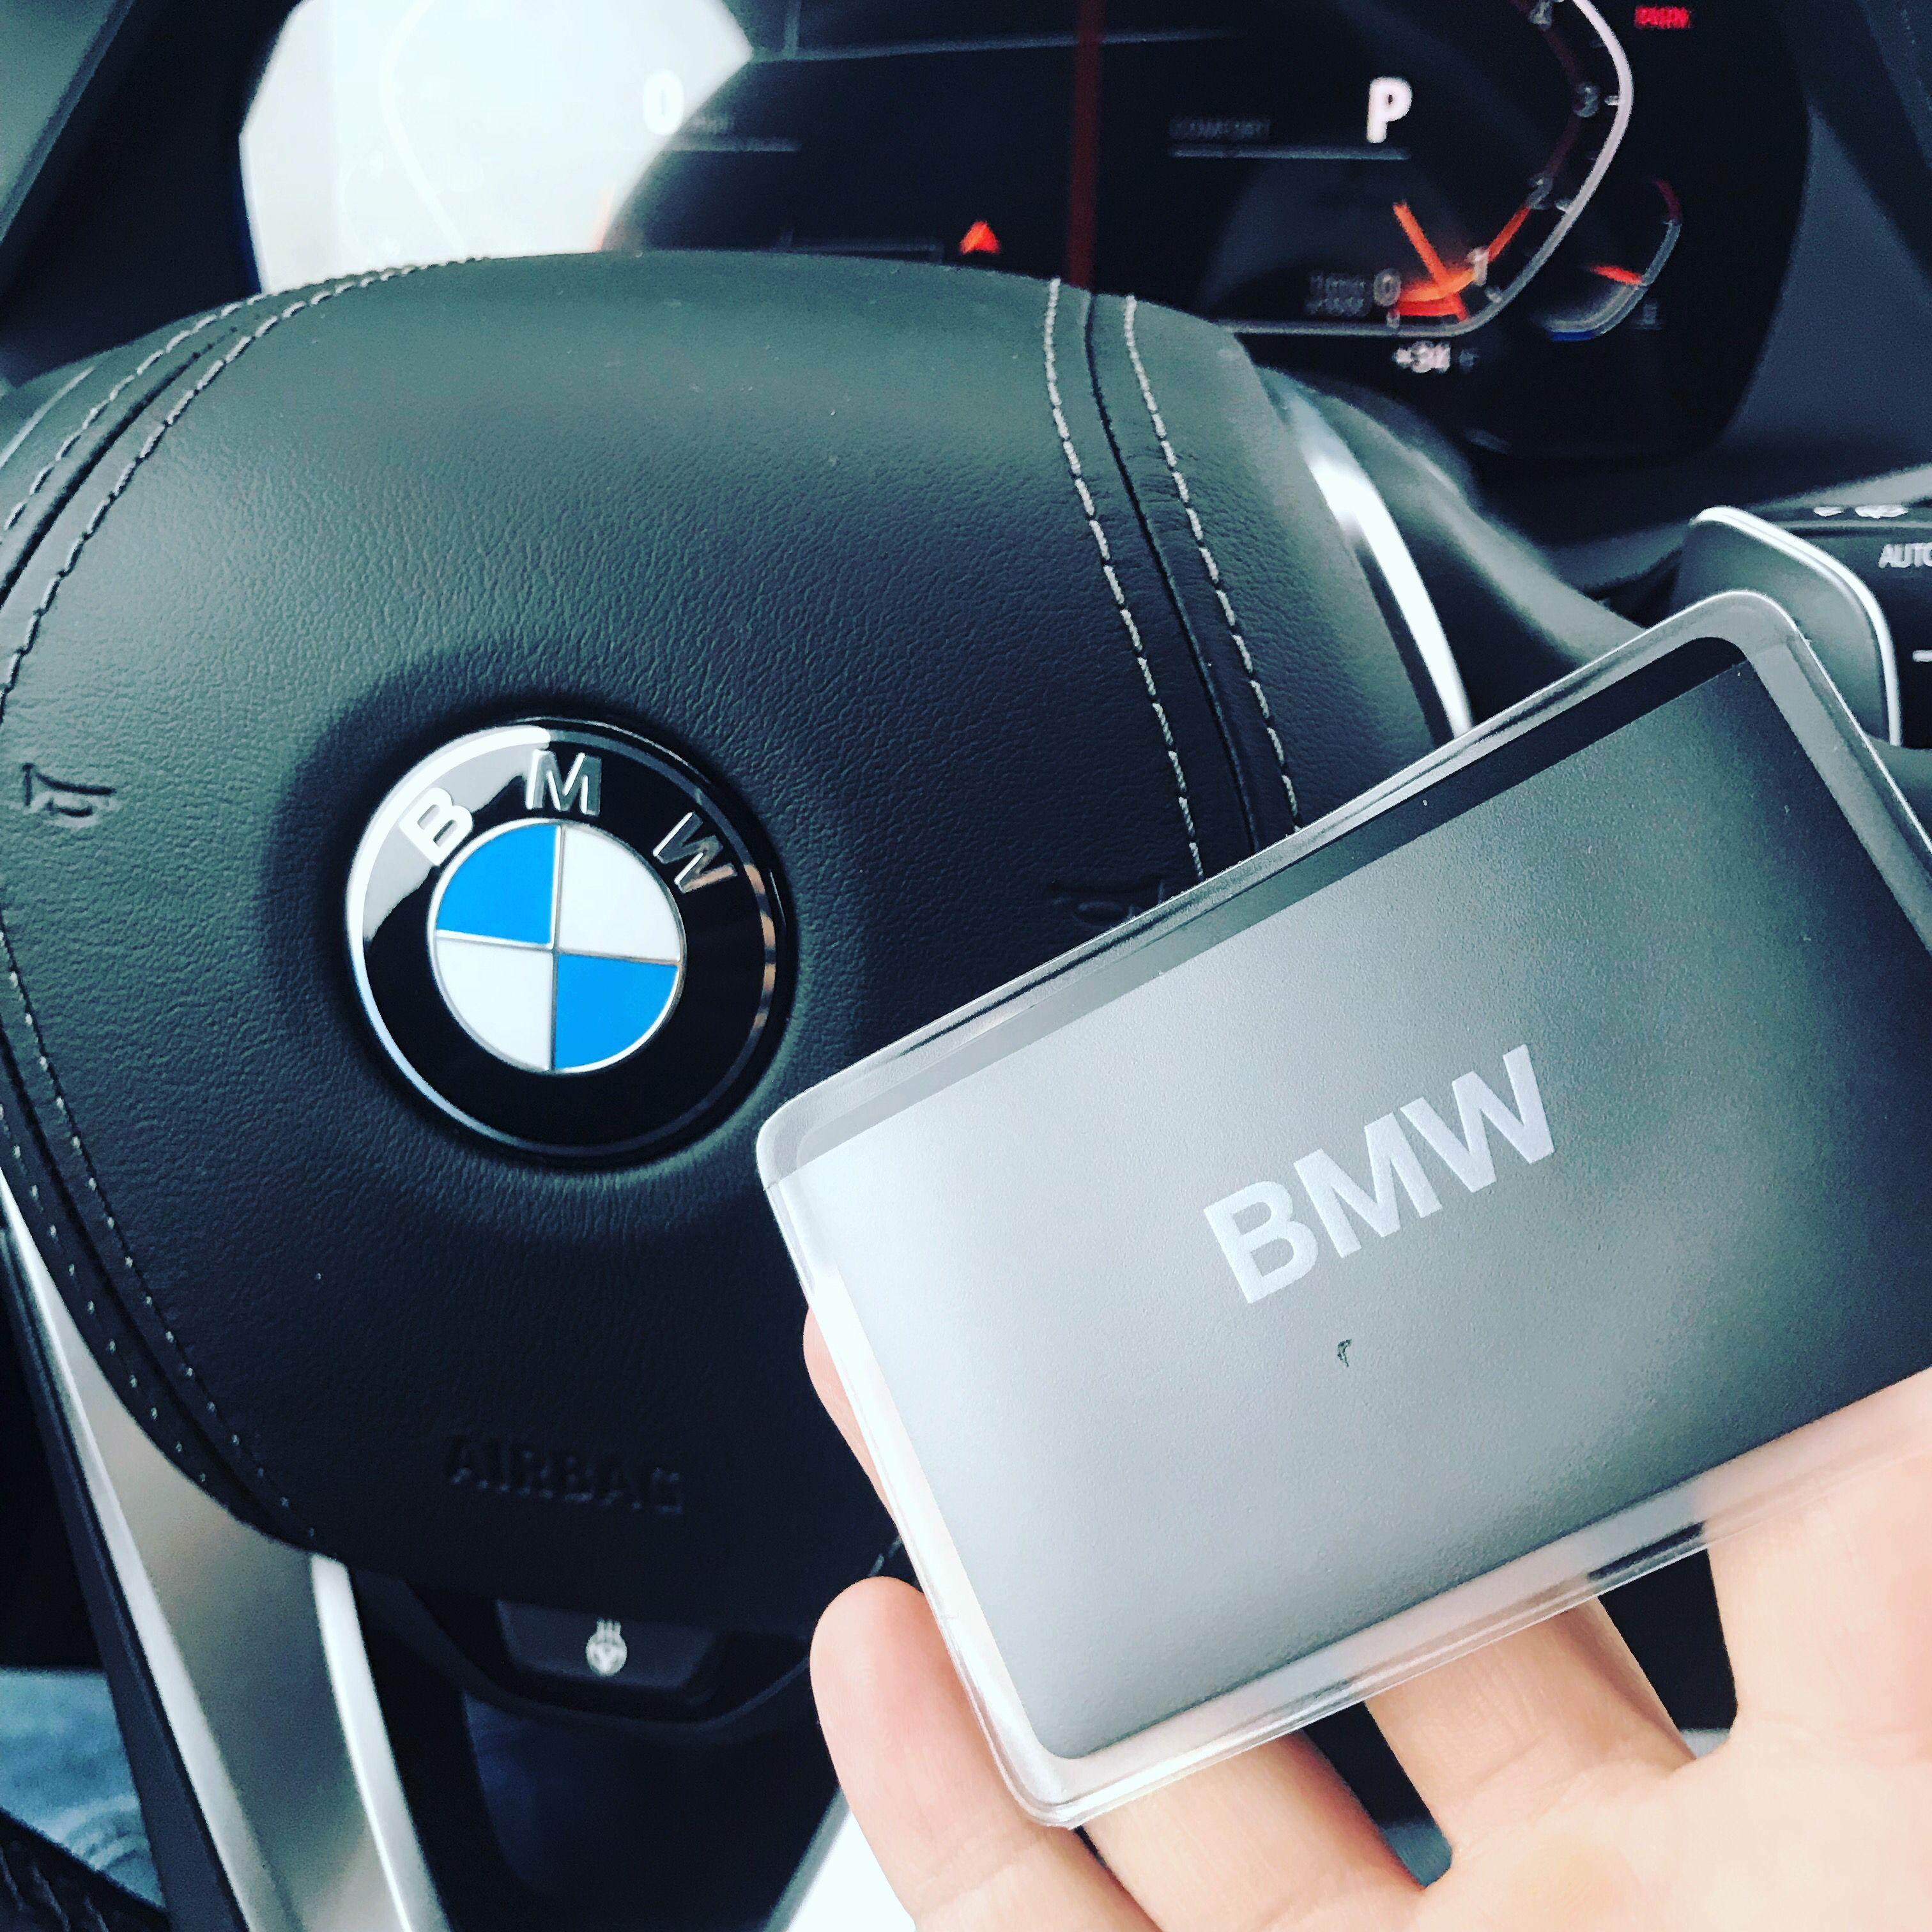 2019 Bmw X5 Credit Card Key The Latest In Automotive Smart Key